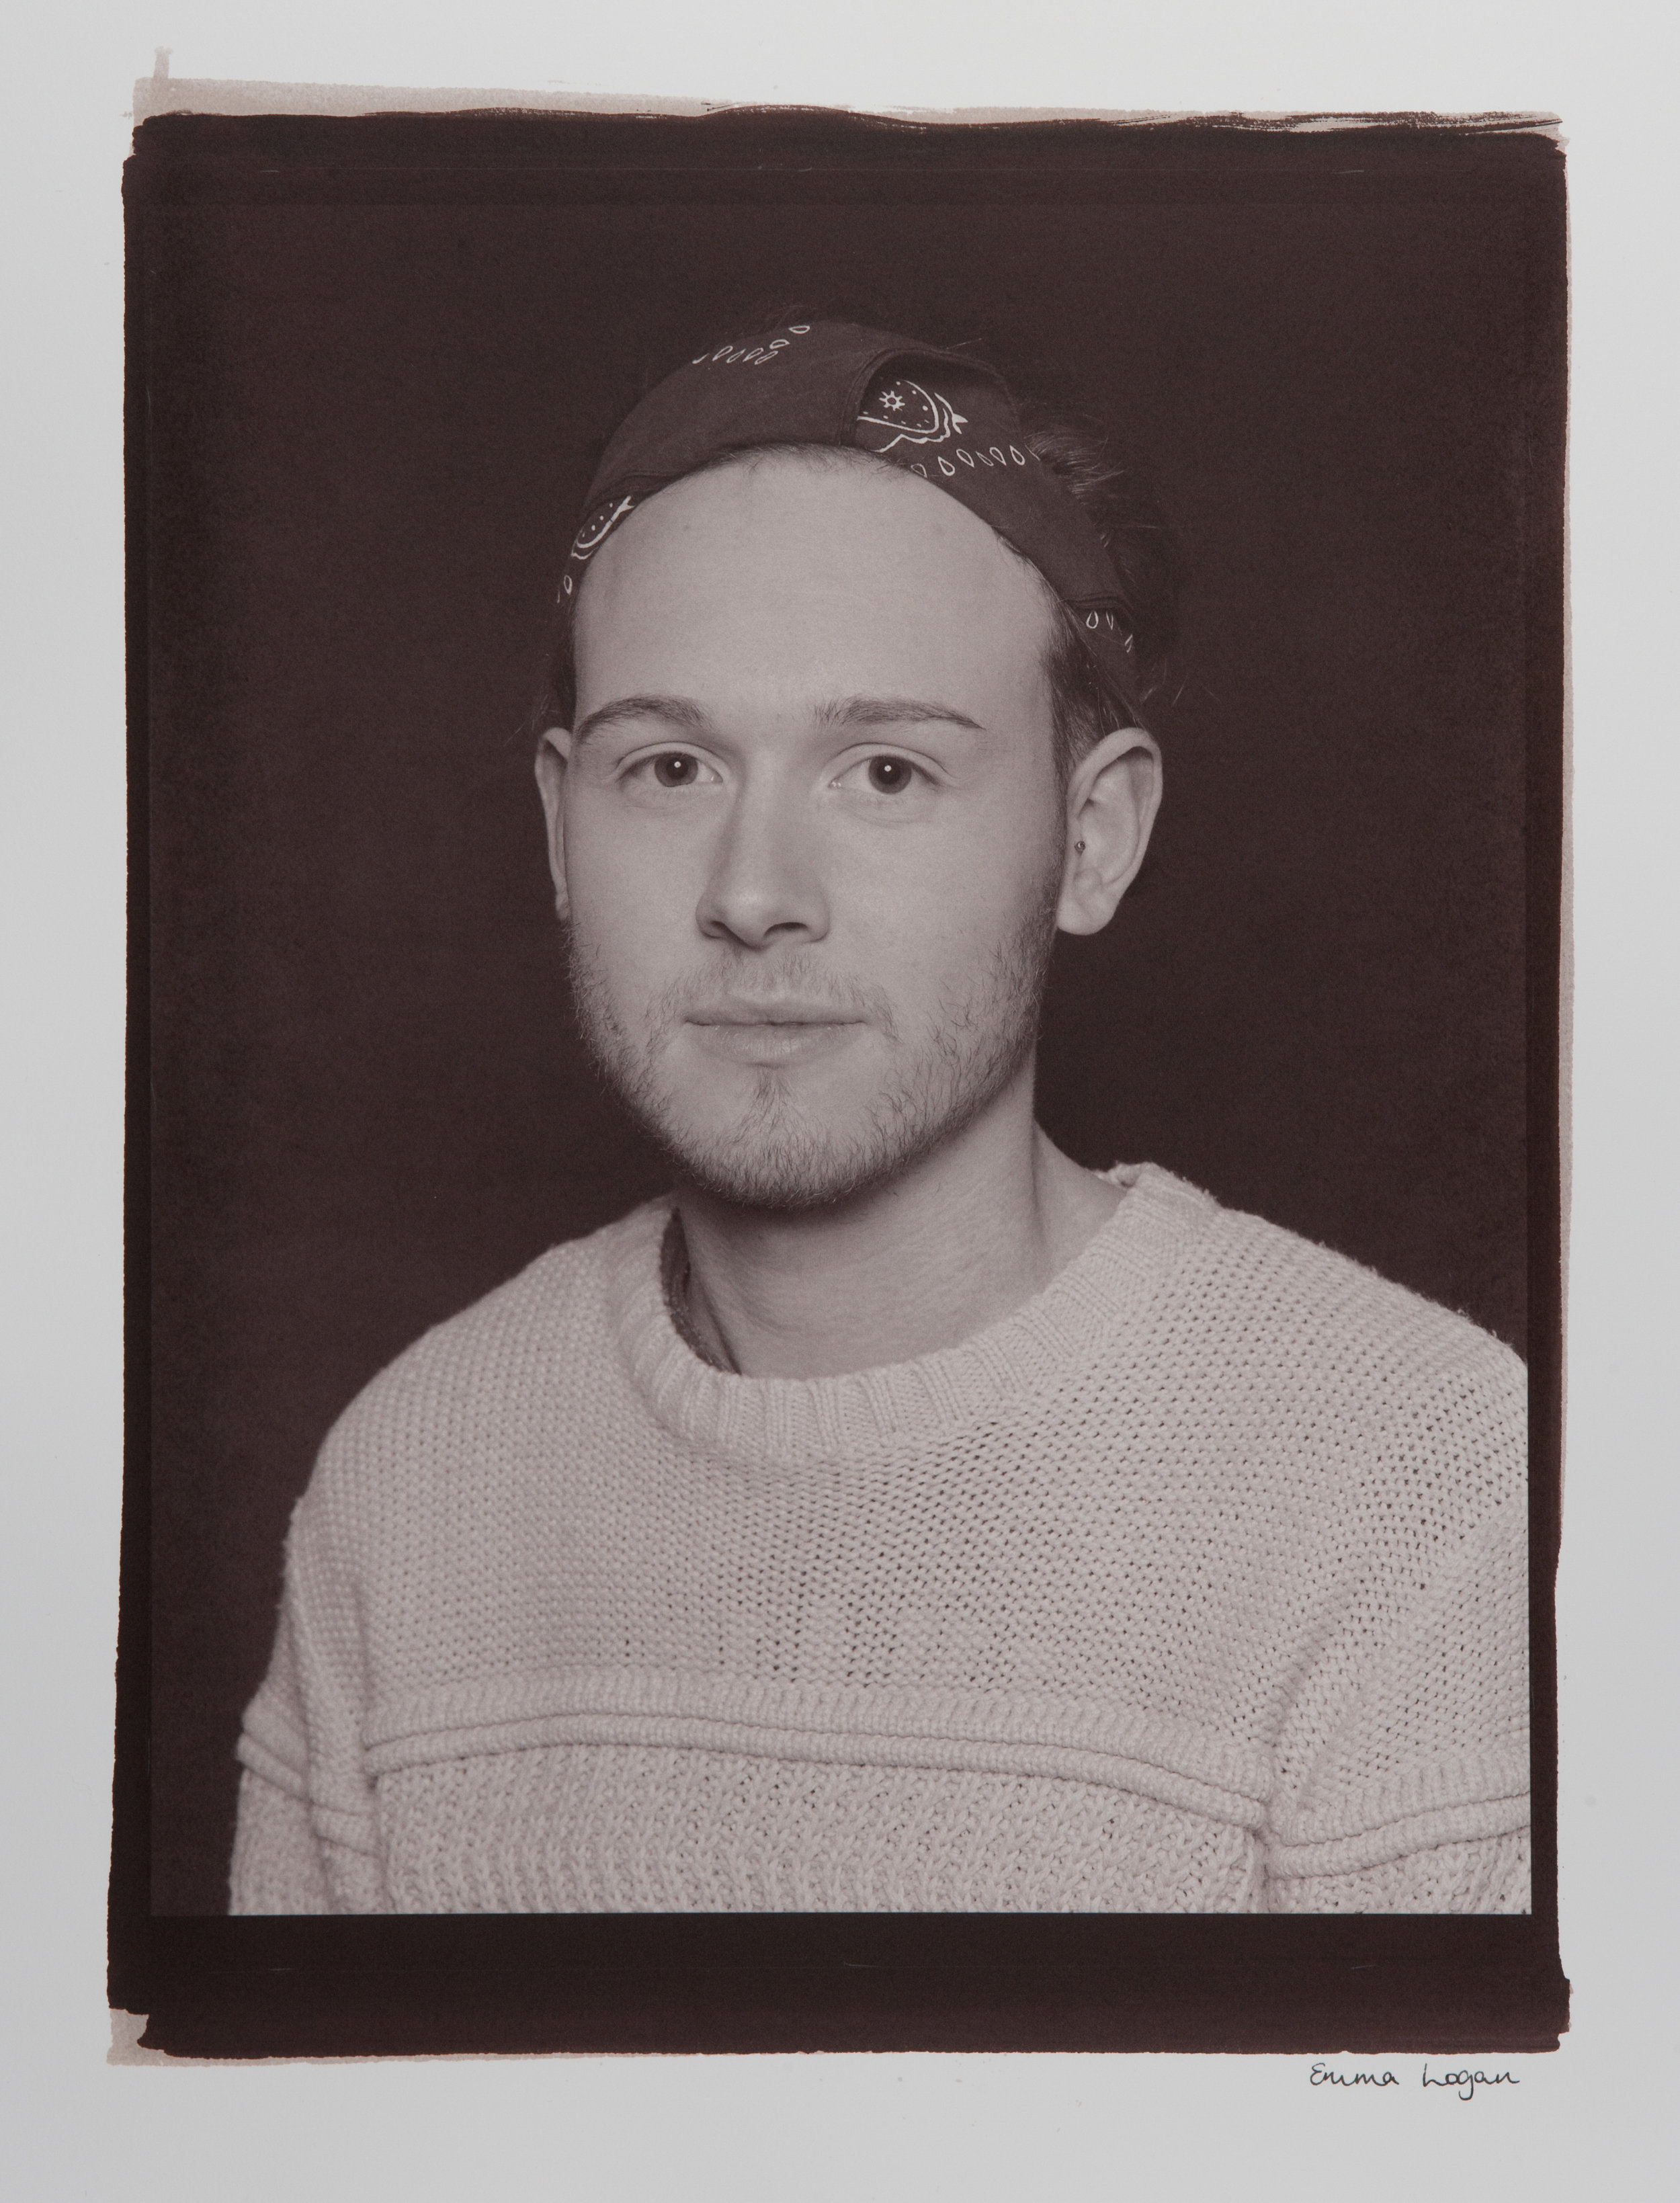 "Formal Portraits. Digital Negative Salt Prints. Original size - 16x20""."